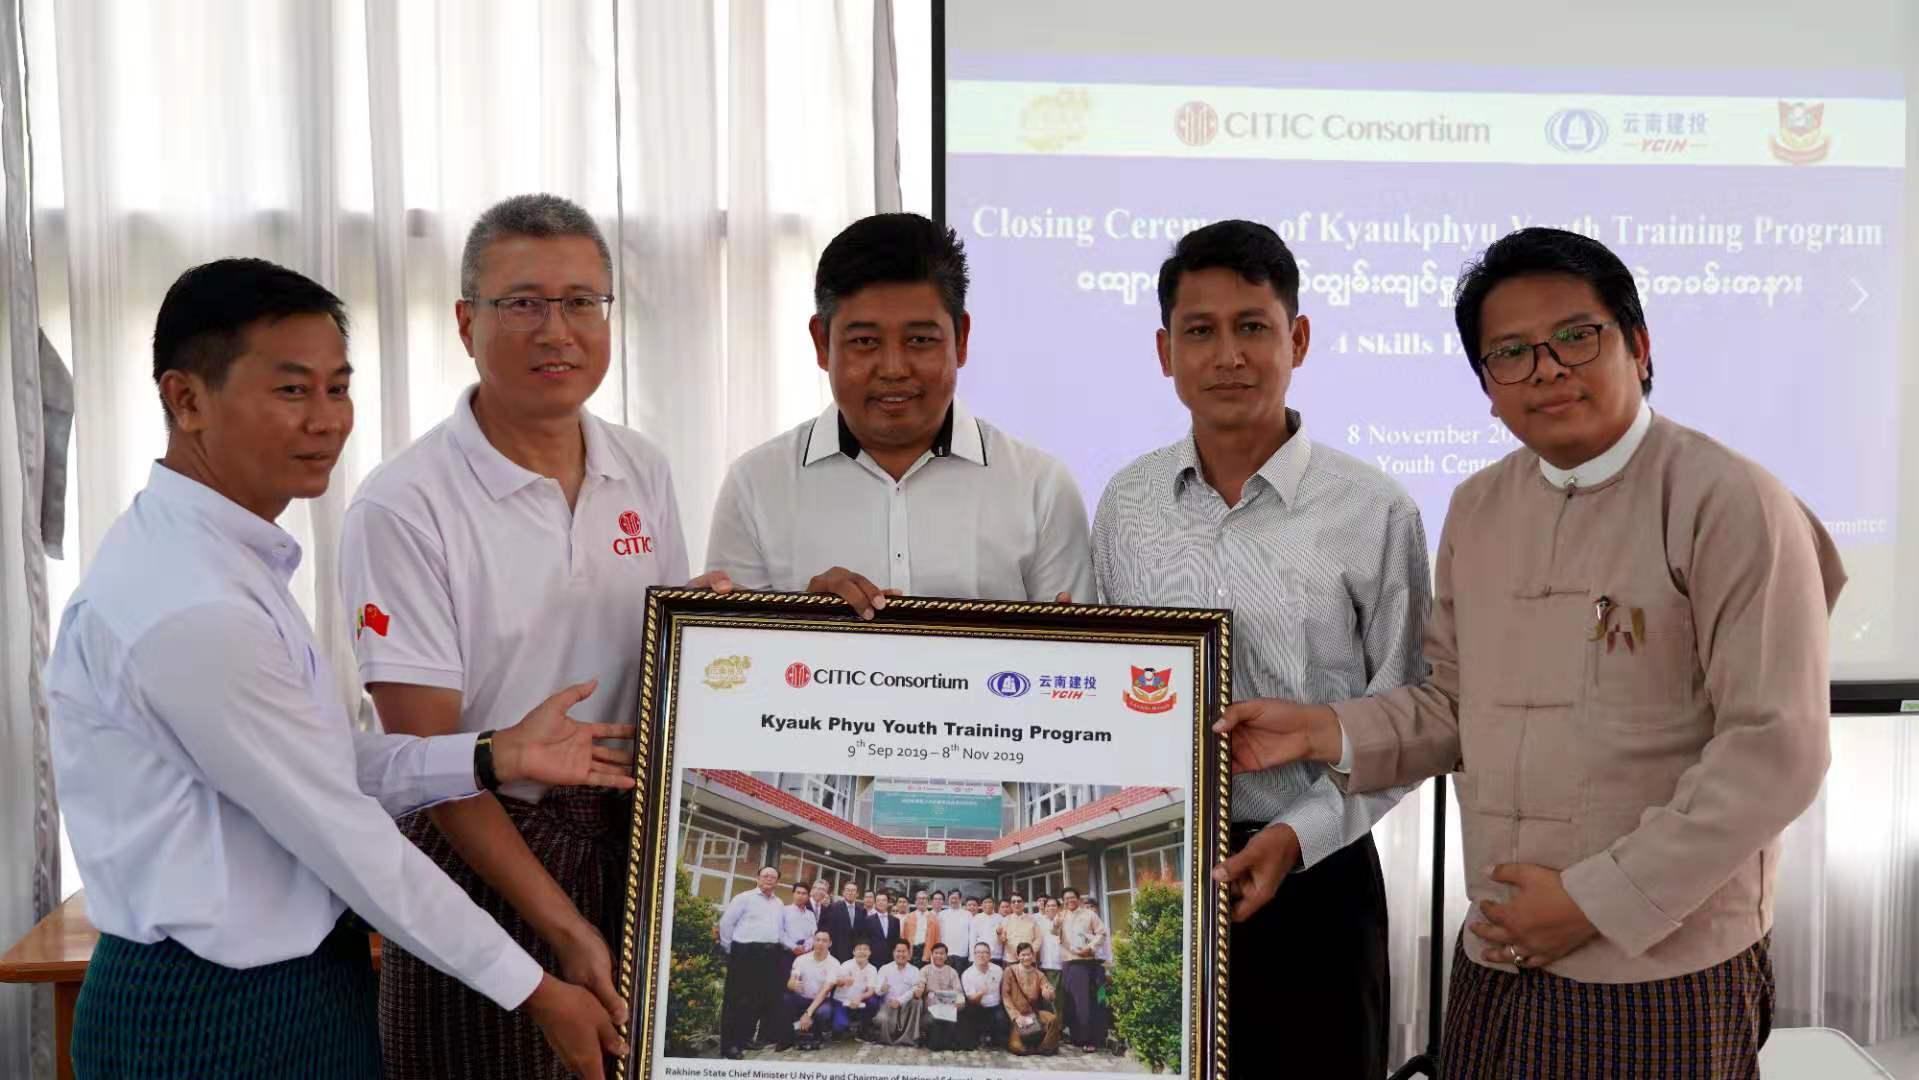 More Kyauk Phyu youth benefited from CITIC Consortium Program